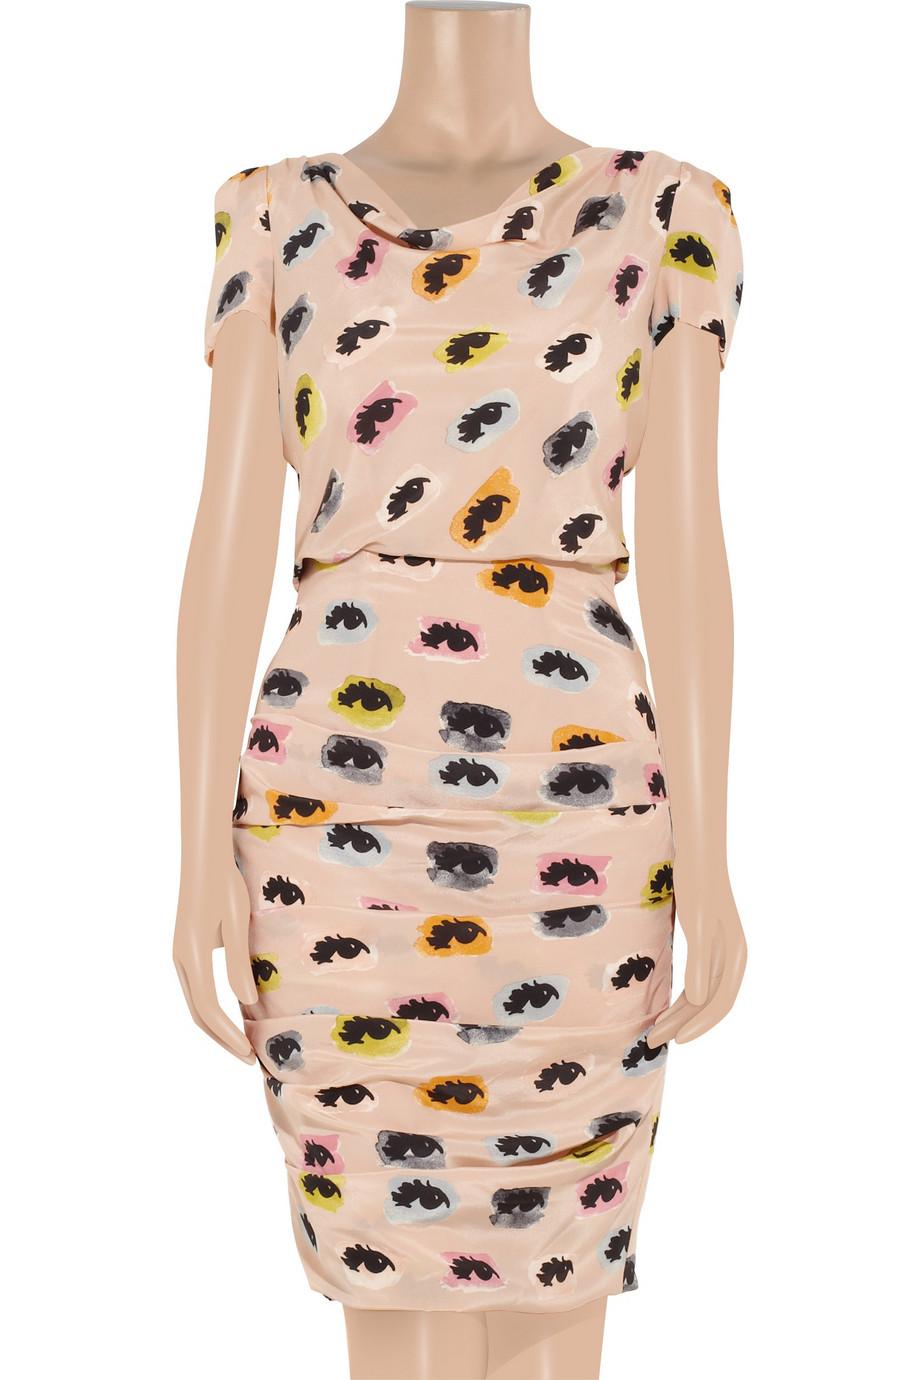 Boutique Moschino Eye Print Draped Silk Dress In Rose